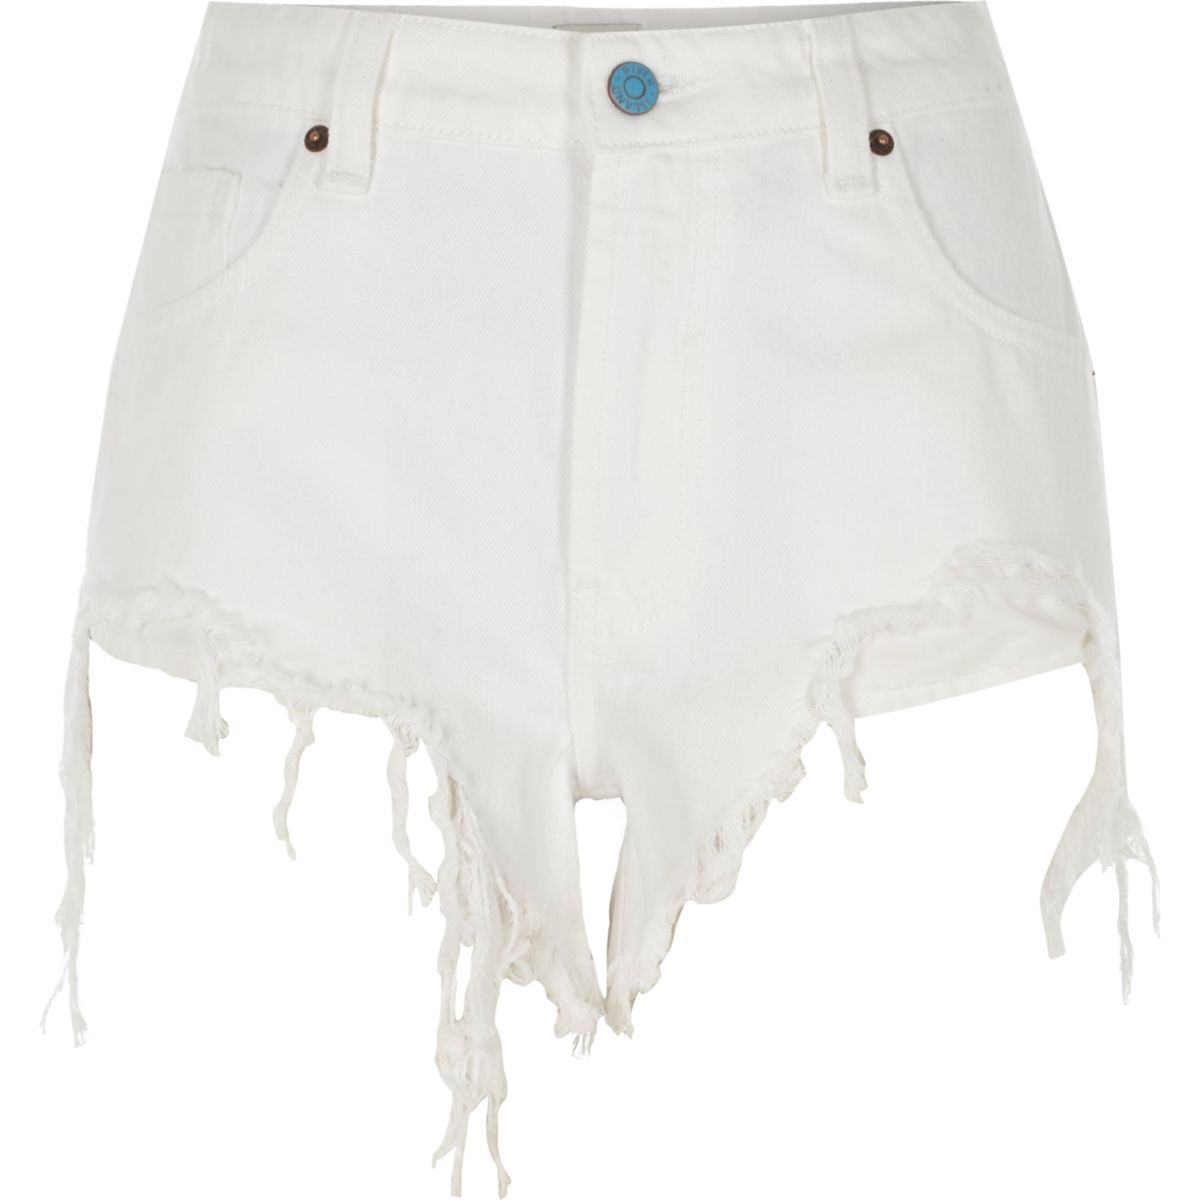 White ripped high side denim shorts